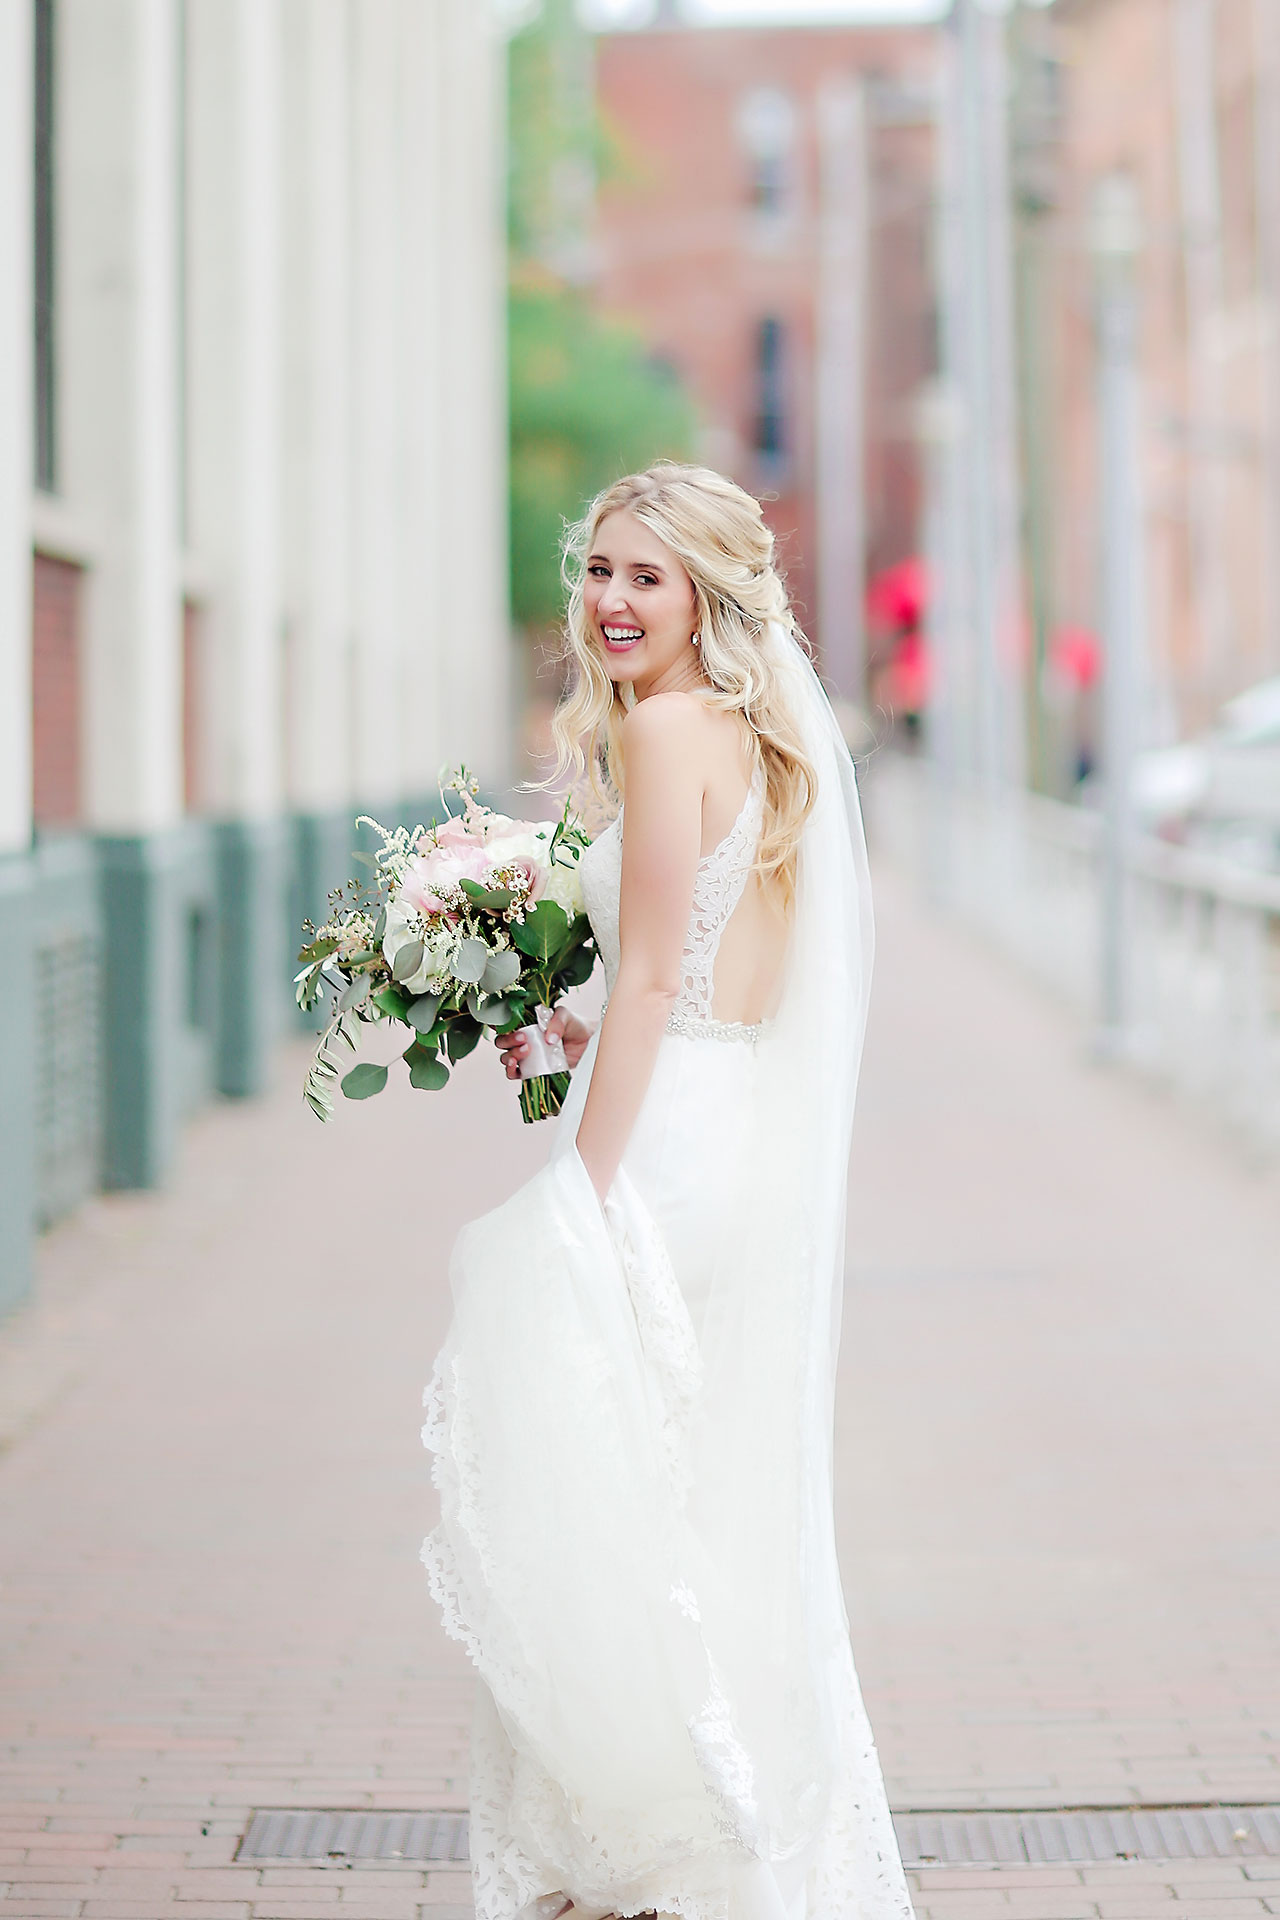 Allison Jeff Union Station Crowne Plaza Indianapolis wedding 108